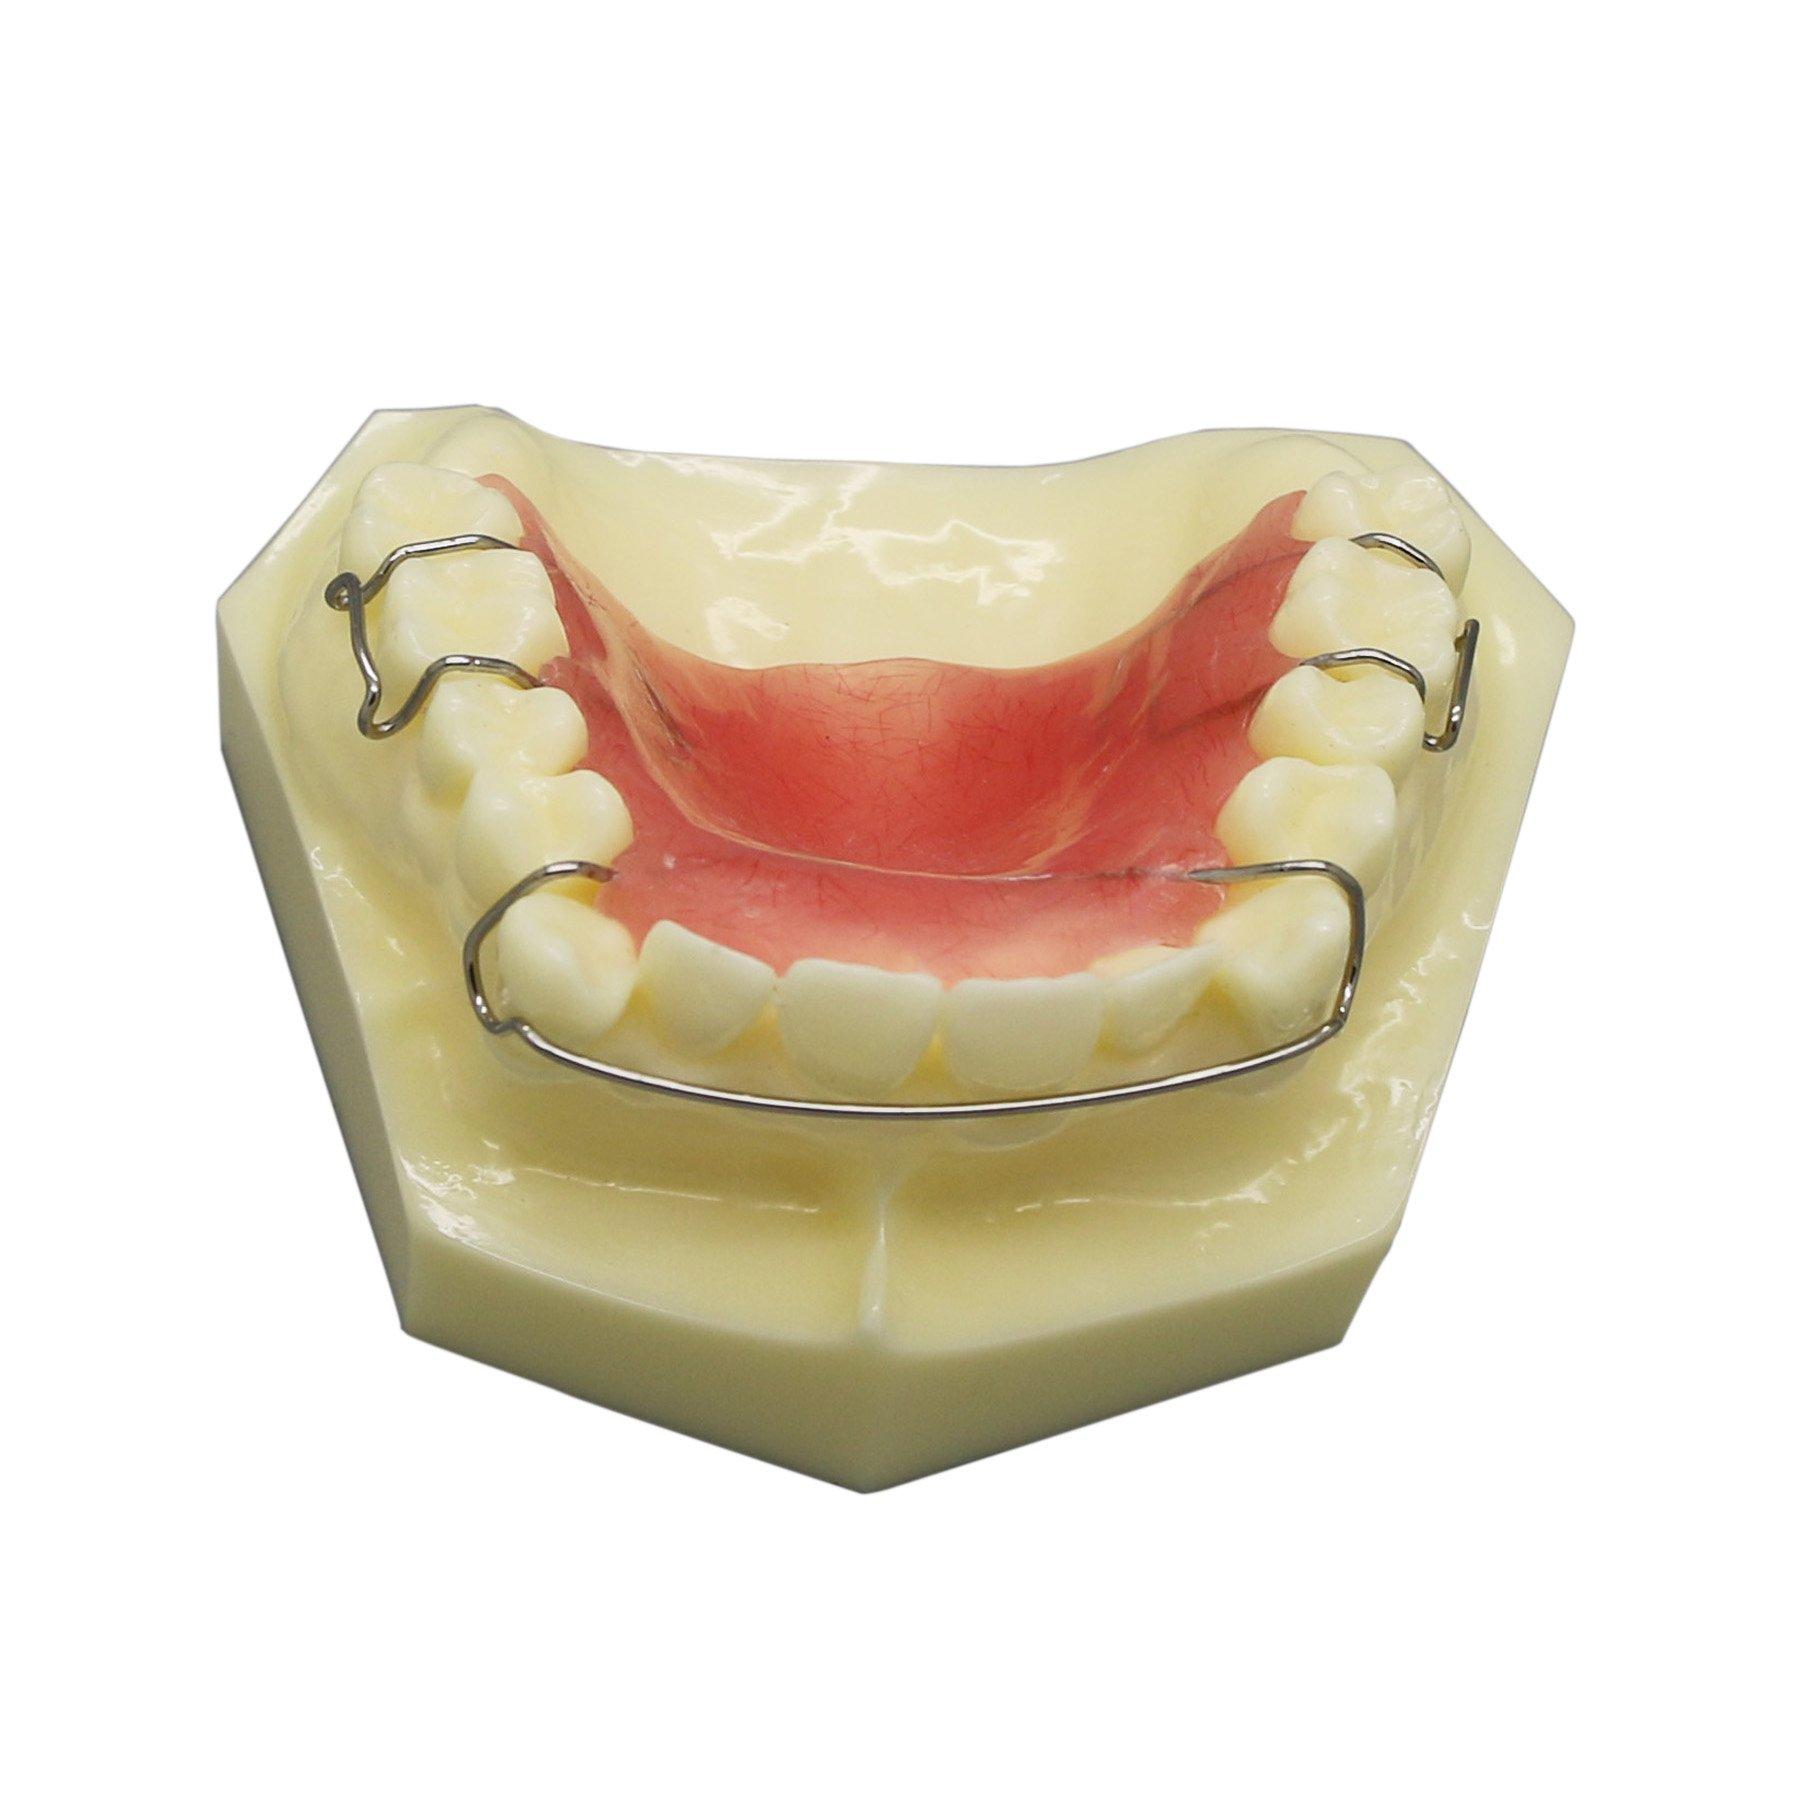 Dental Model #3007 01 - Hawley Retainer Model